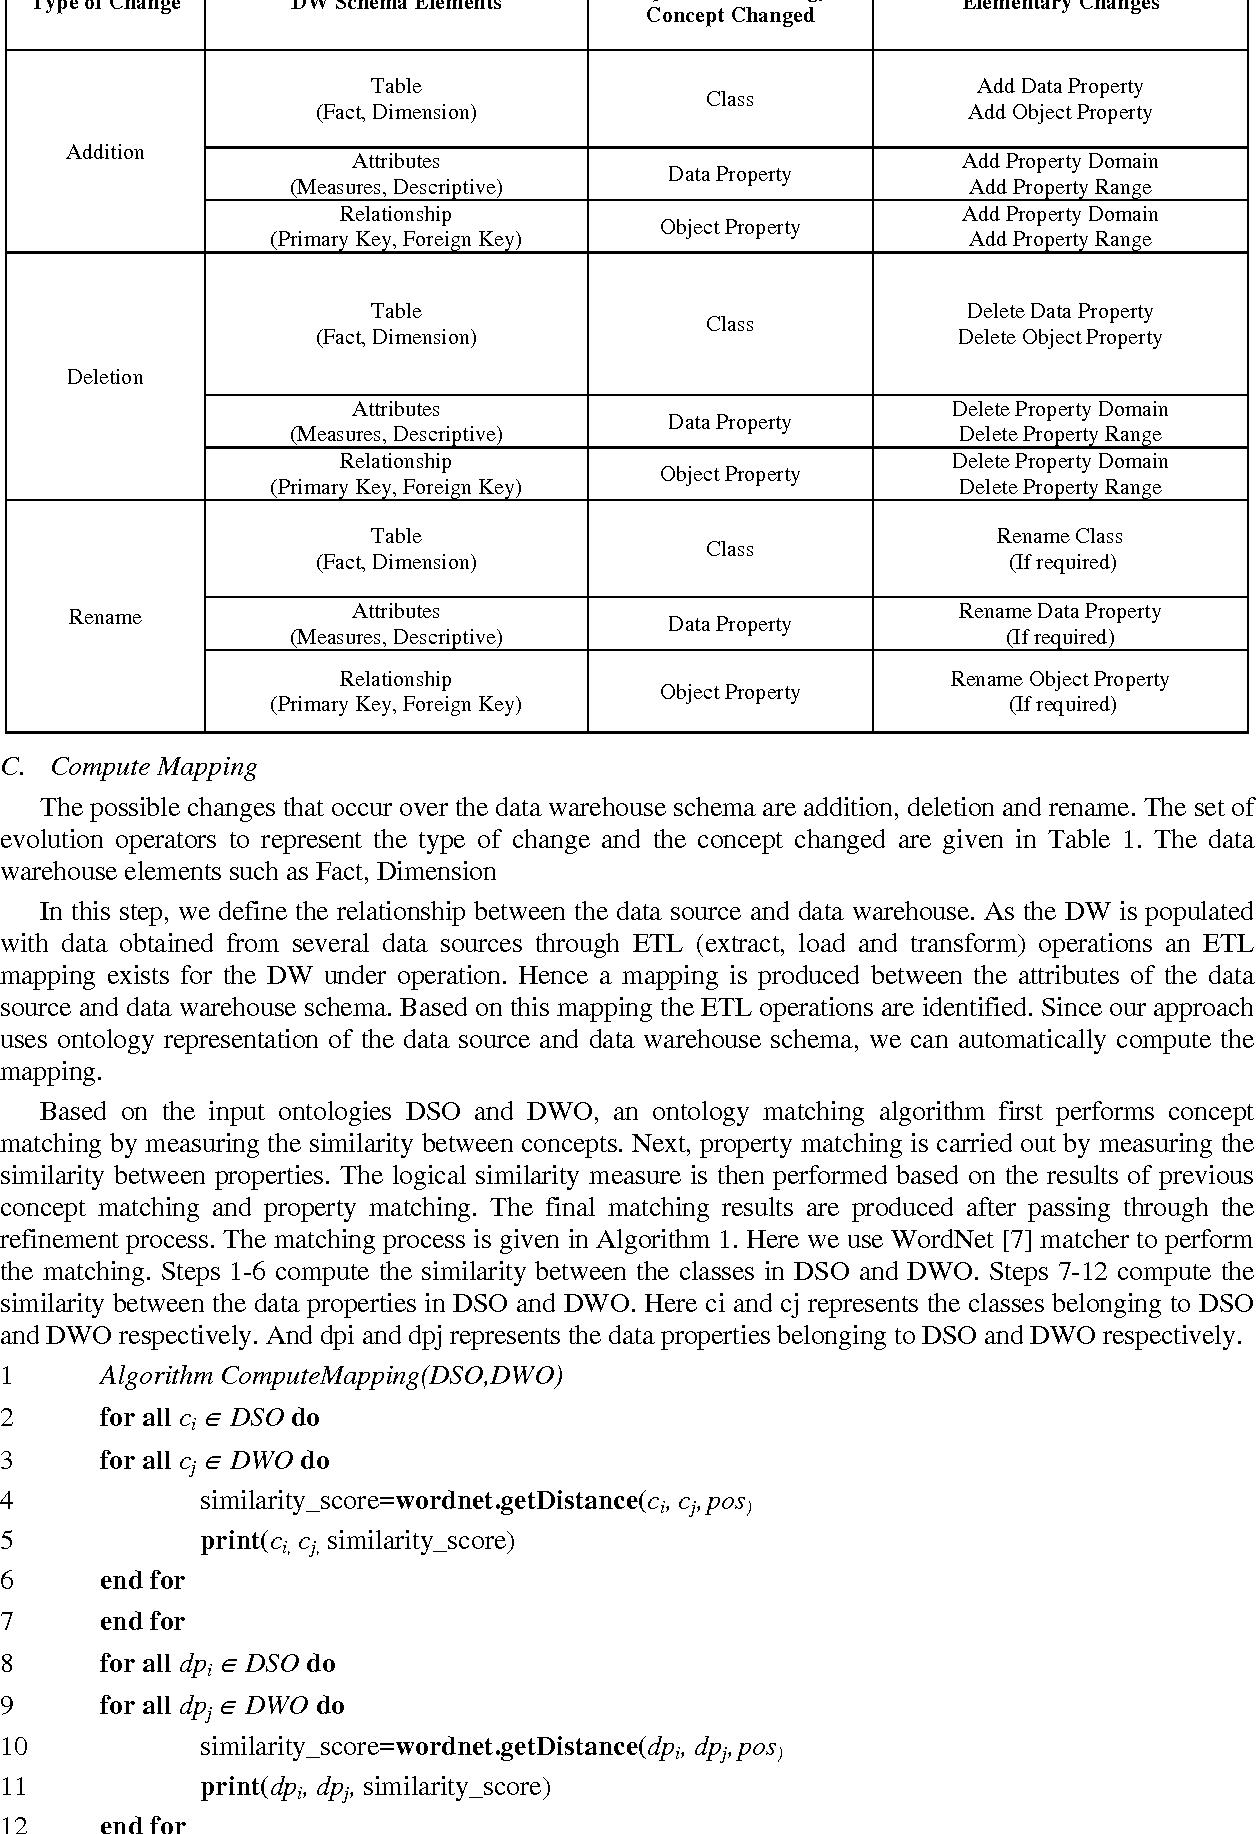 PDF] Data Warehouse Schema Evolution and Adaptation